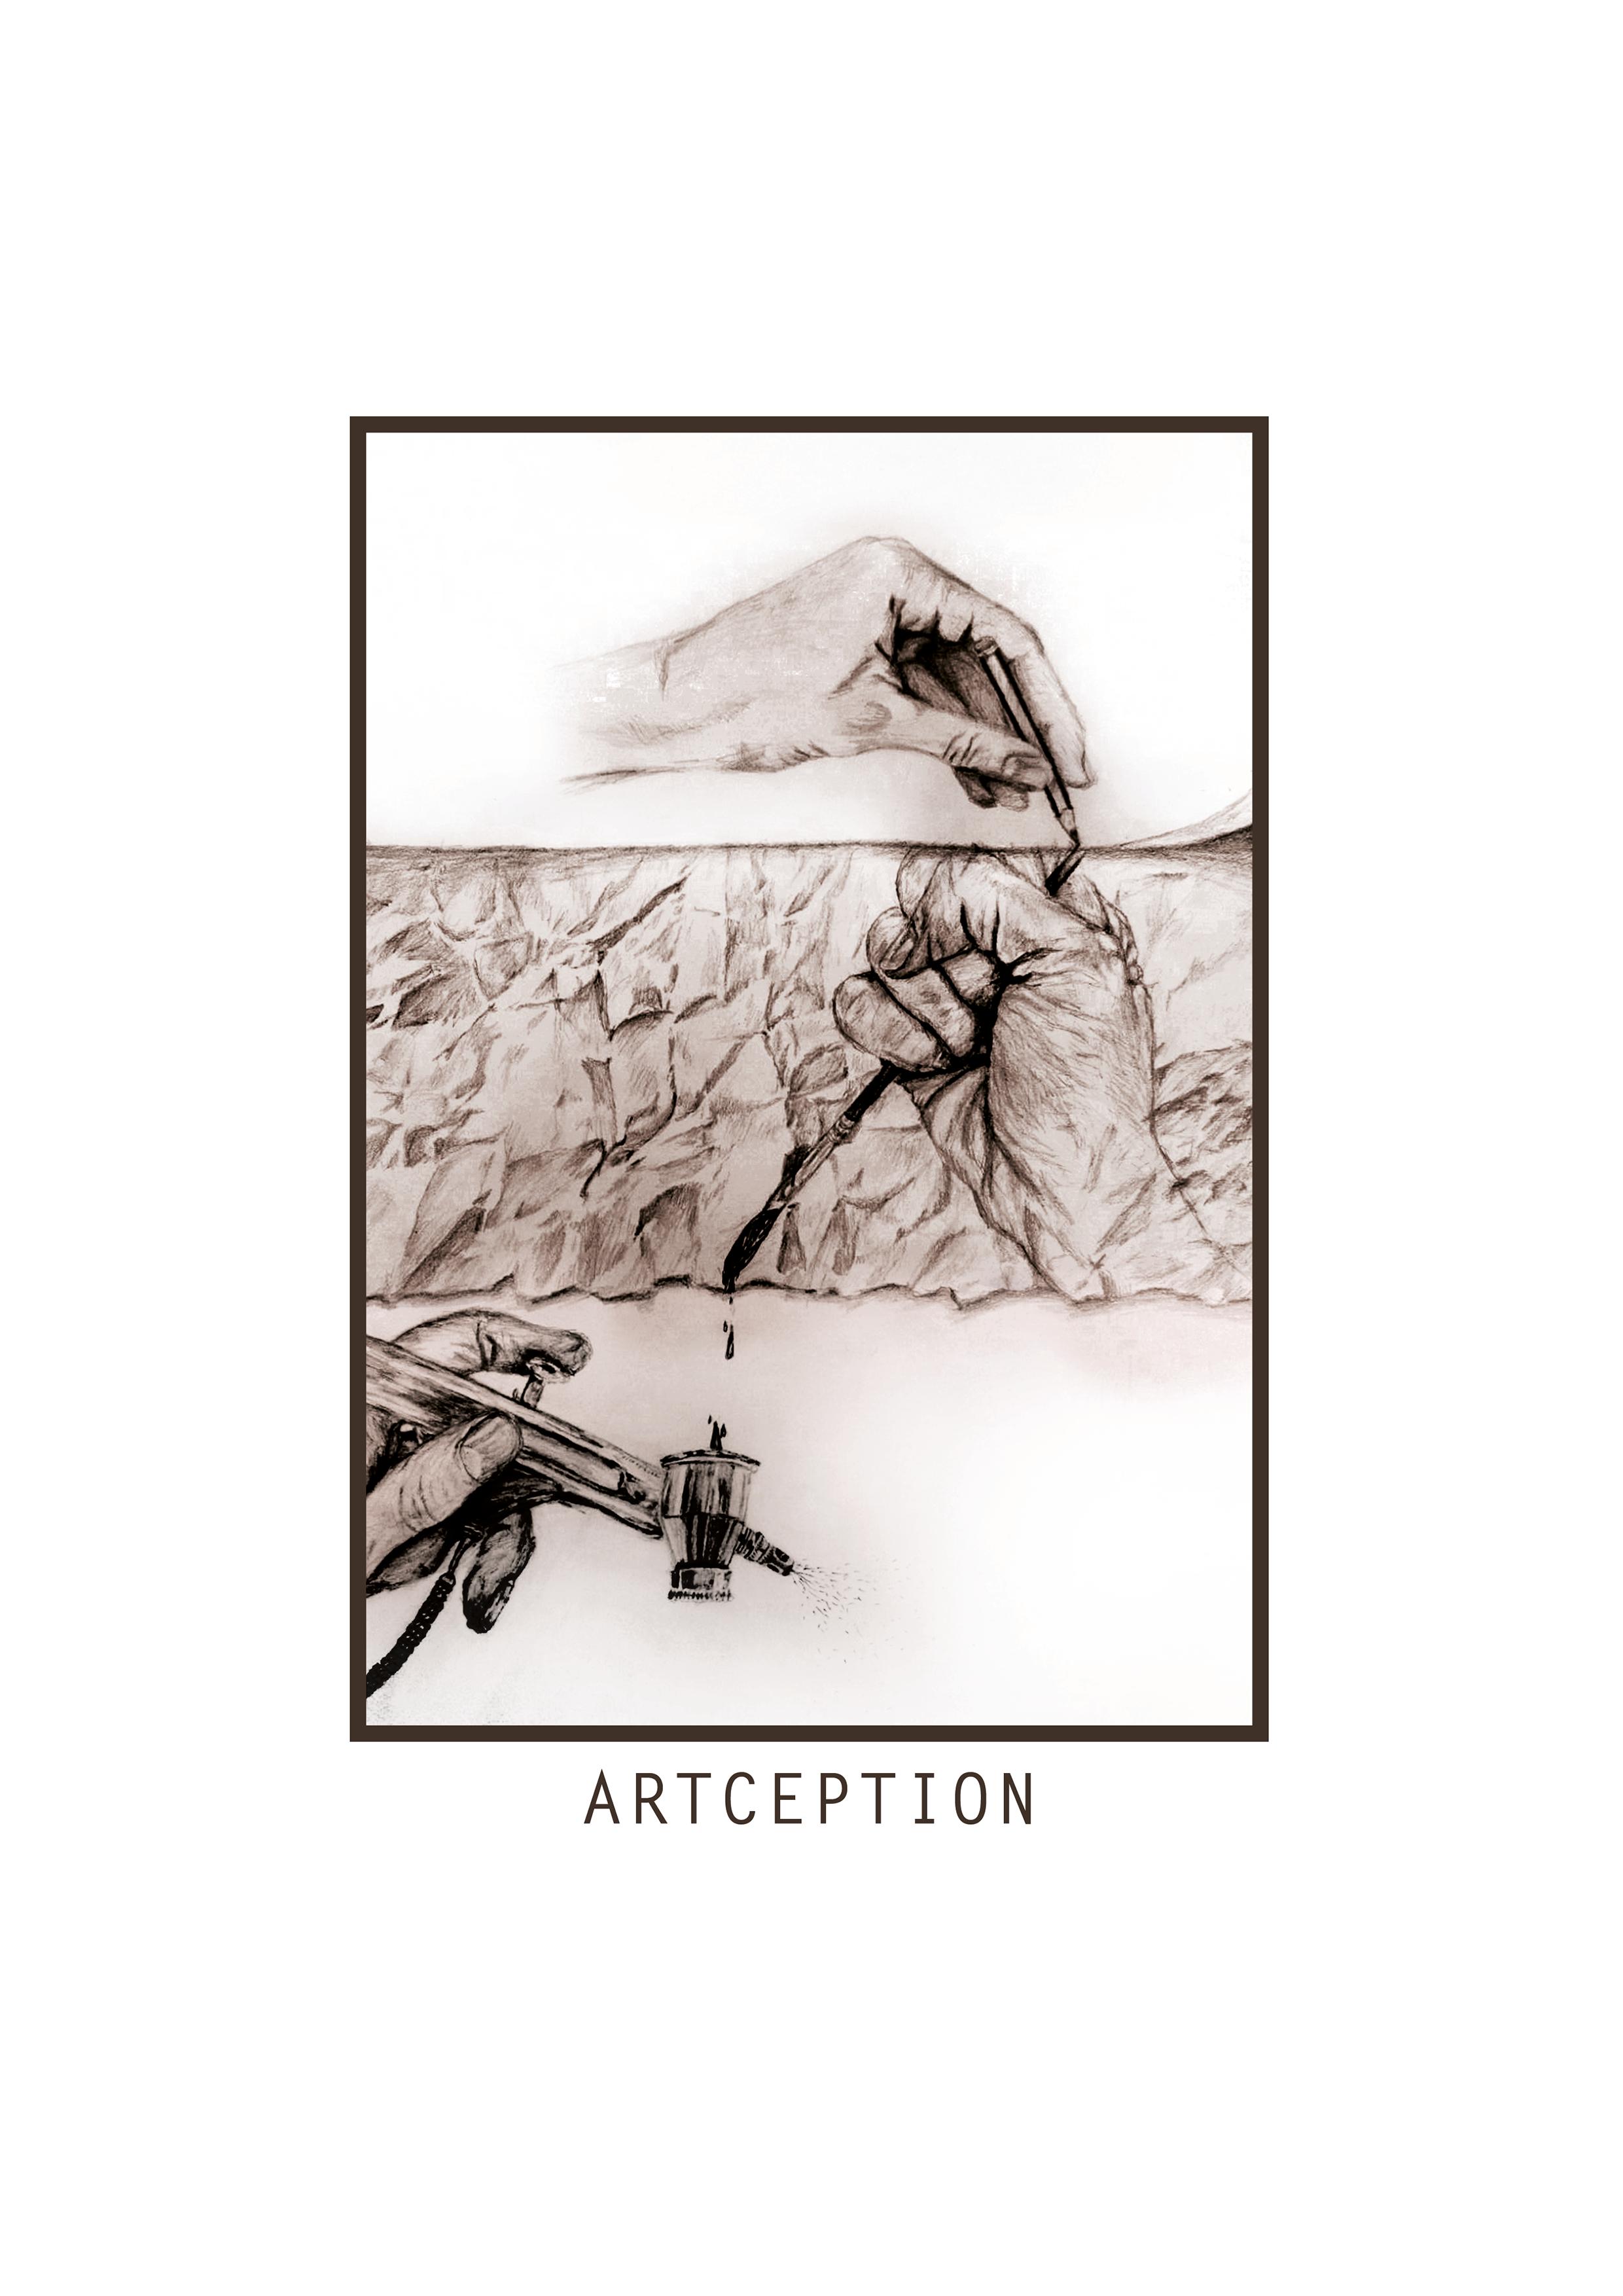 Artception